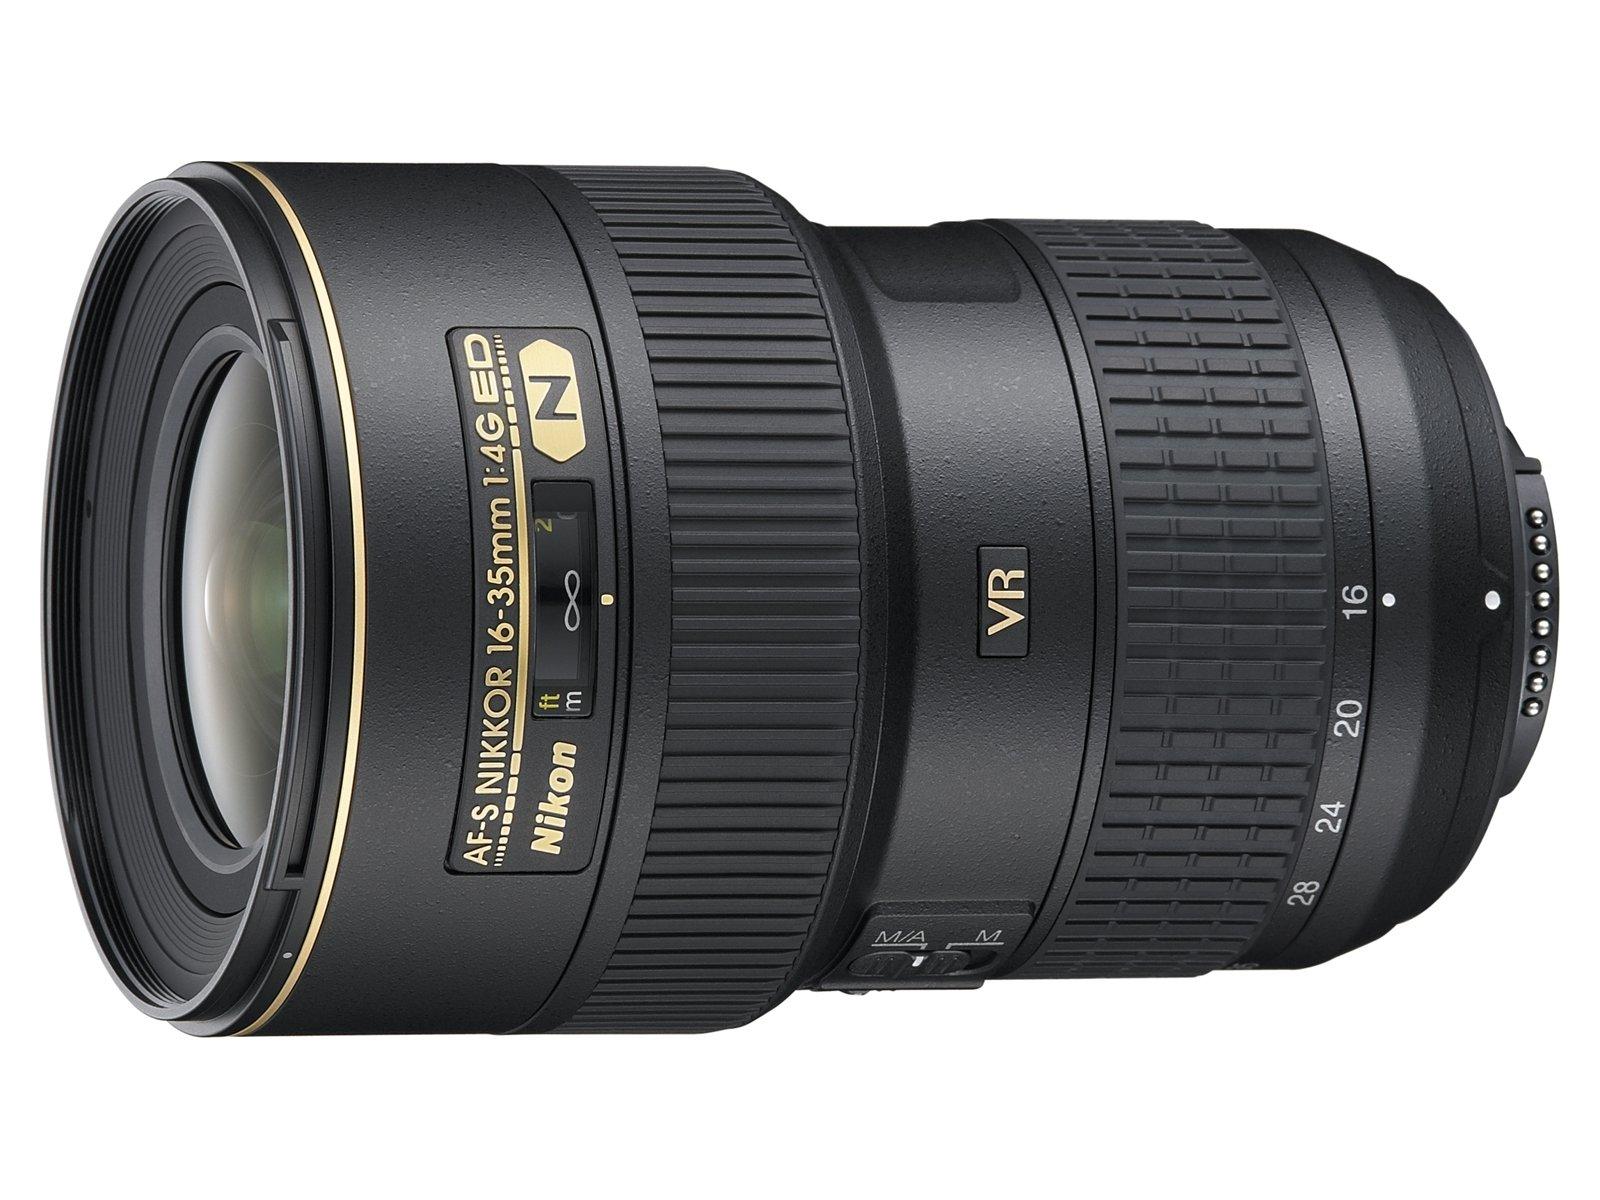 Nikon 16 35mm f4G VR review